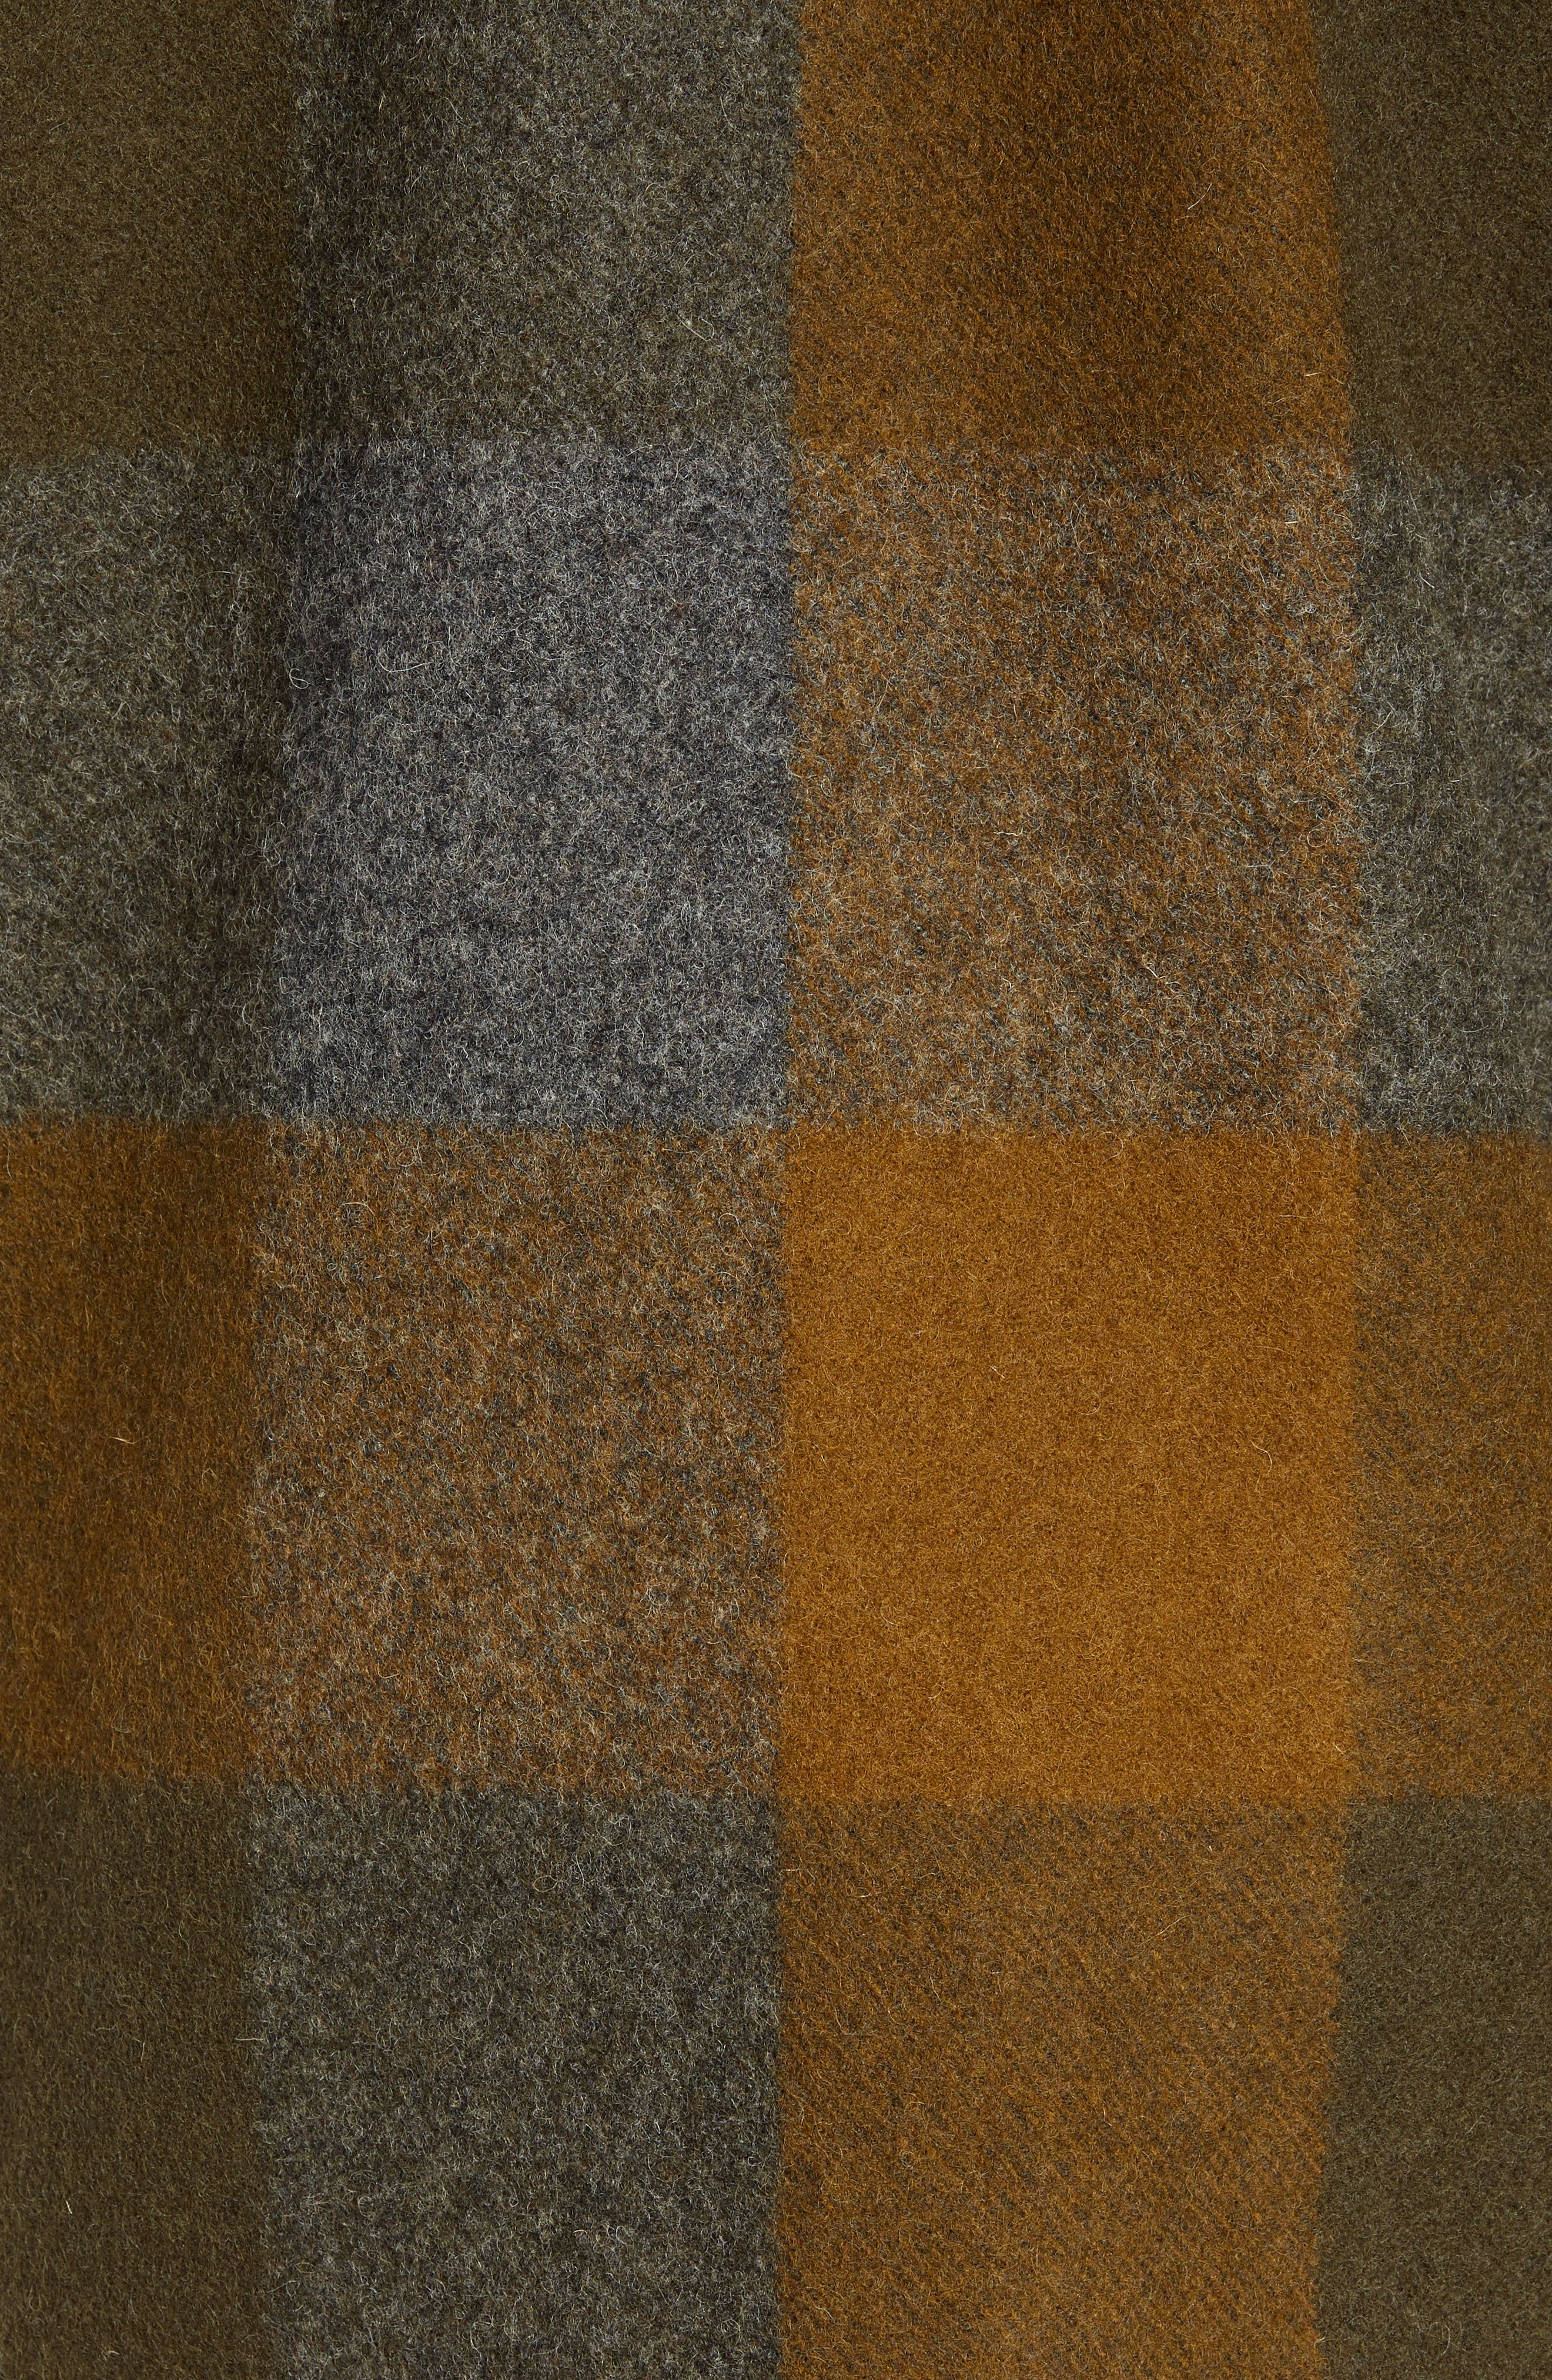 Mackinaw Plaid Wool Flannel Shirt Jacket,                             Alternate thumbnail 7, color,                             233